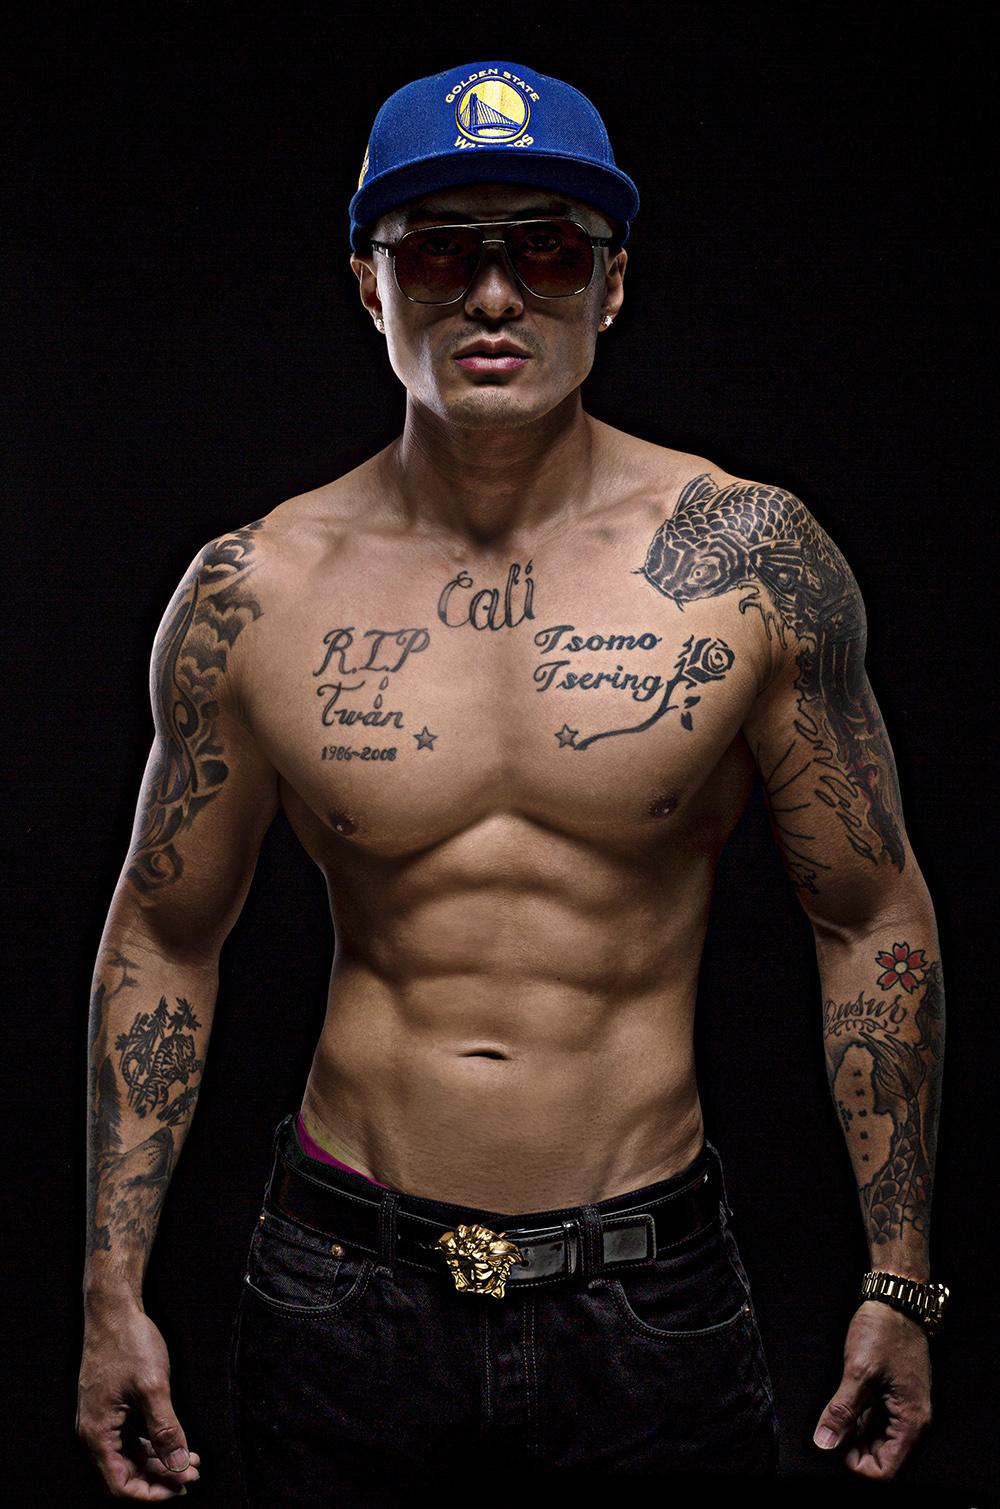 Mike_Tsering_Fitness_Portrait_01_WEB.jpg